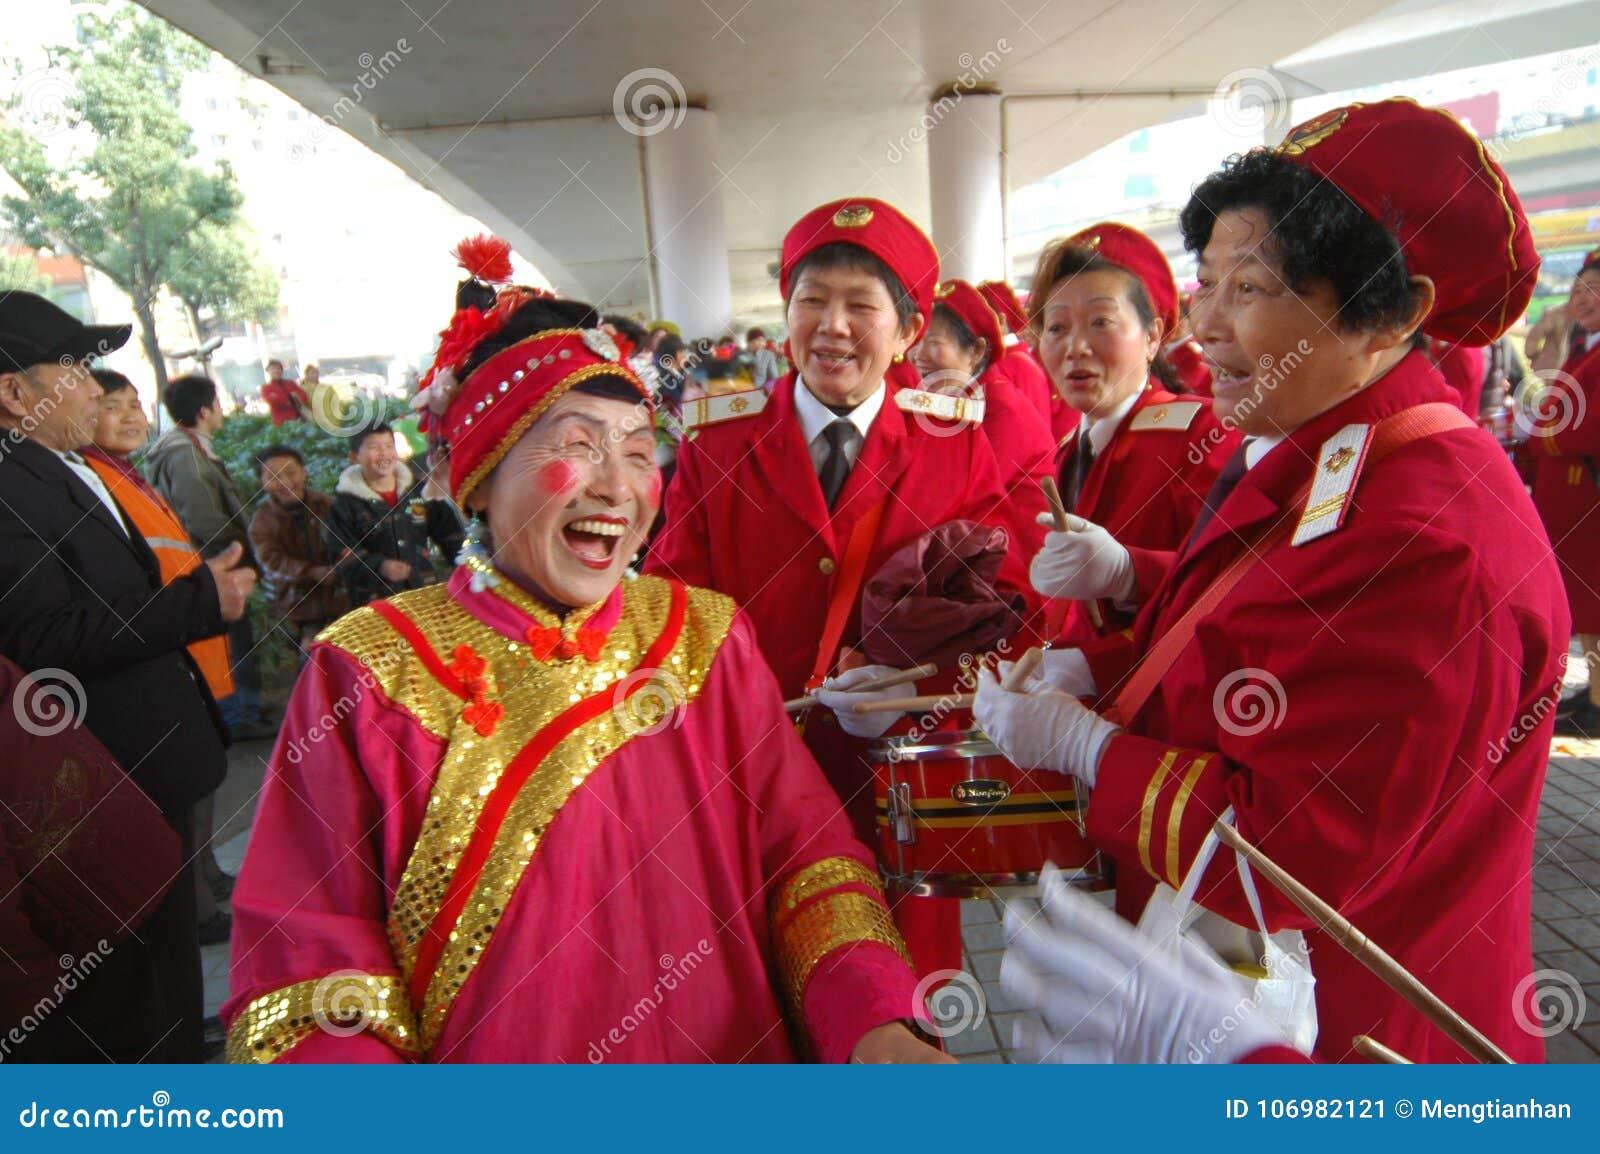 Chinese matchmaking ceremony